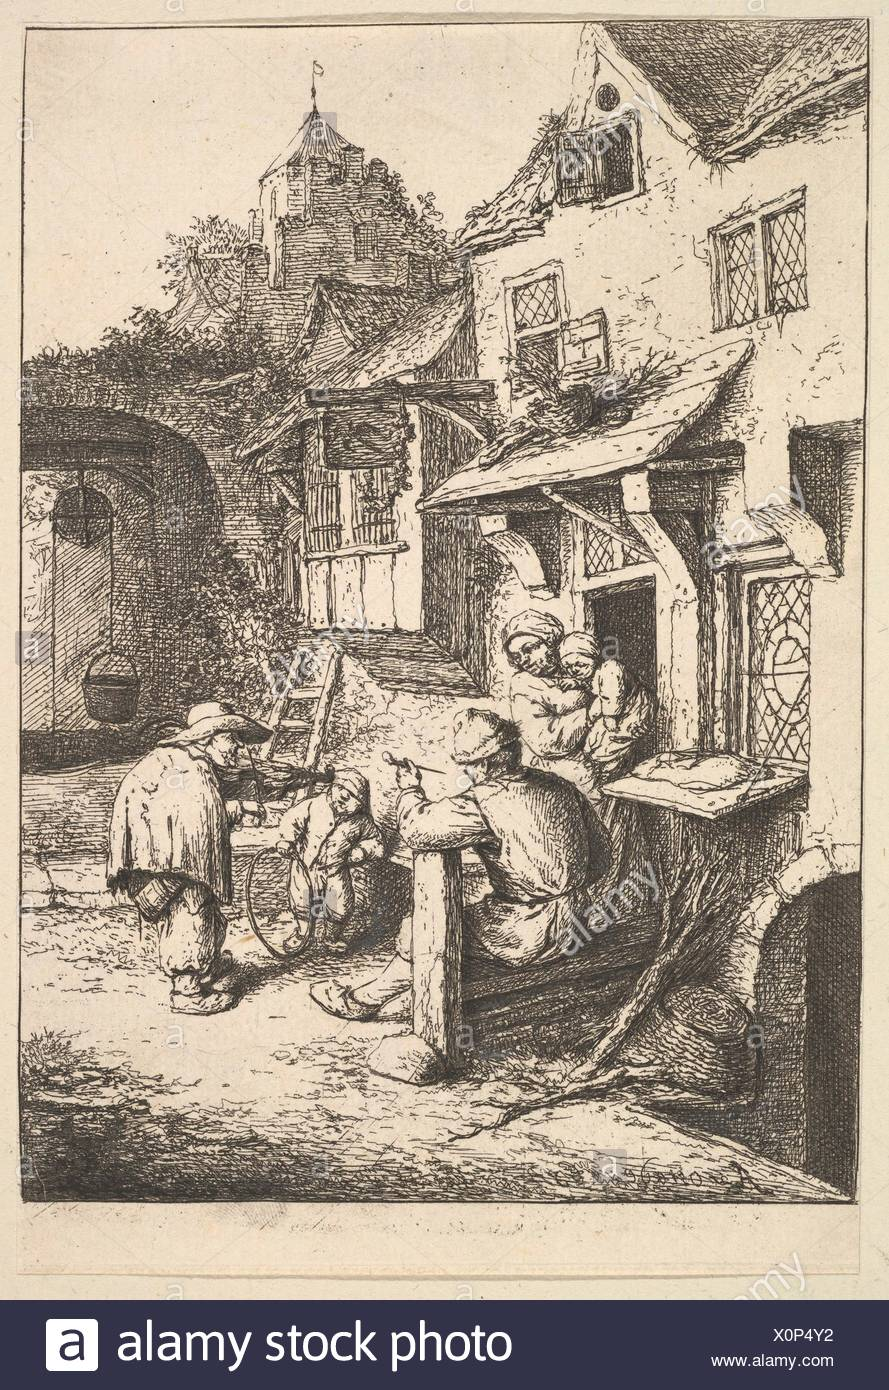 The Humpbacked Violinist. Artist: Adriaen van Ostade (Dutch, Haarlem 1610-1685 Haarlem); Date: 1610-85; Medium: Etching; Dimensions: Sheet: 6 5/16 x - Stock Image